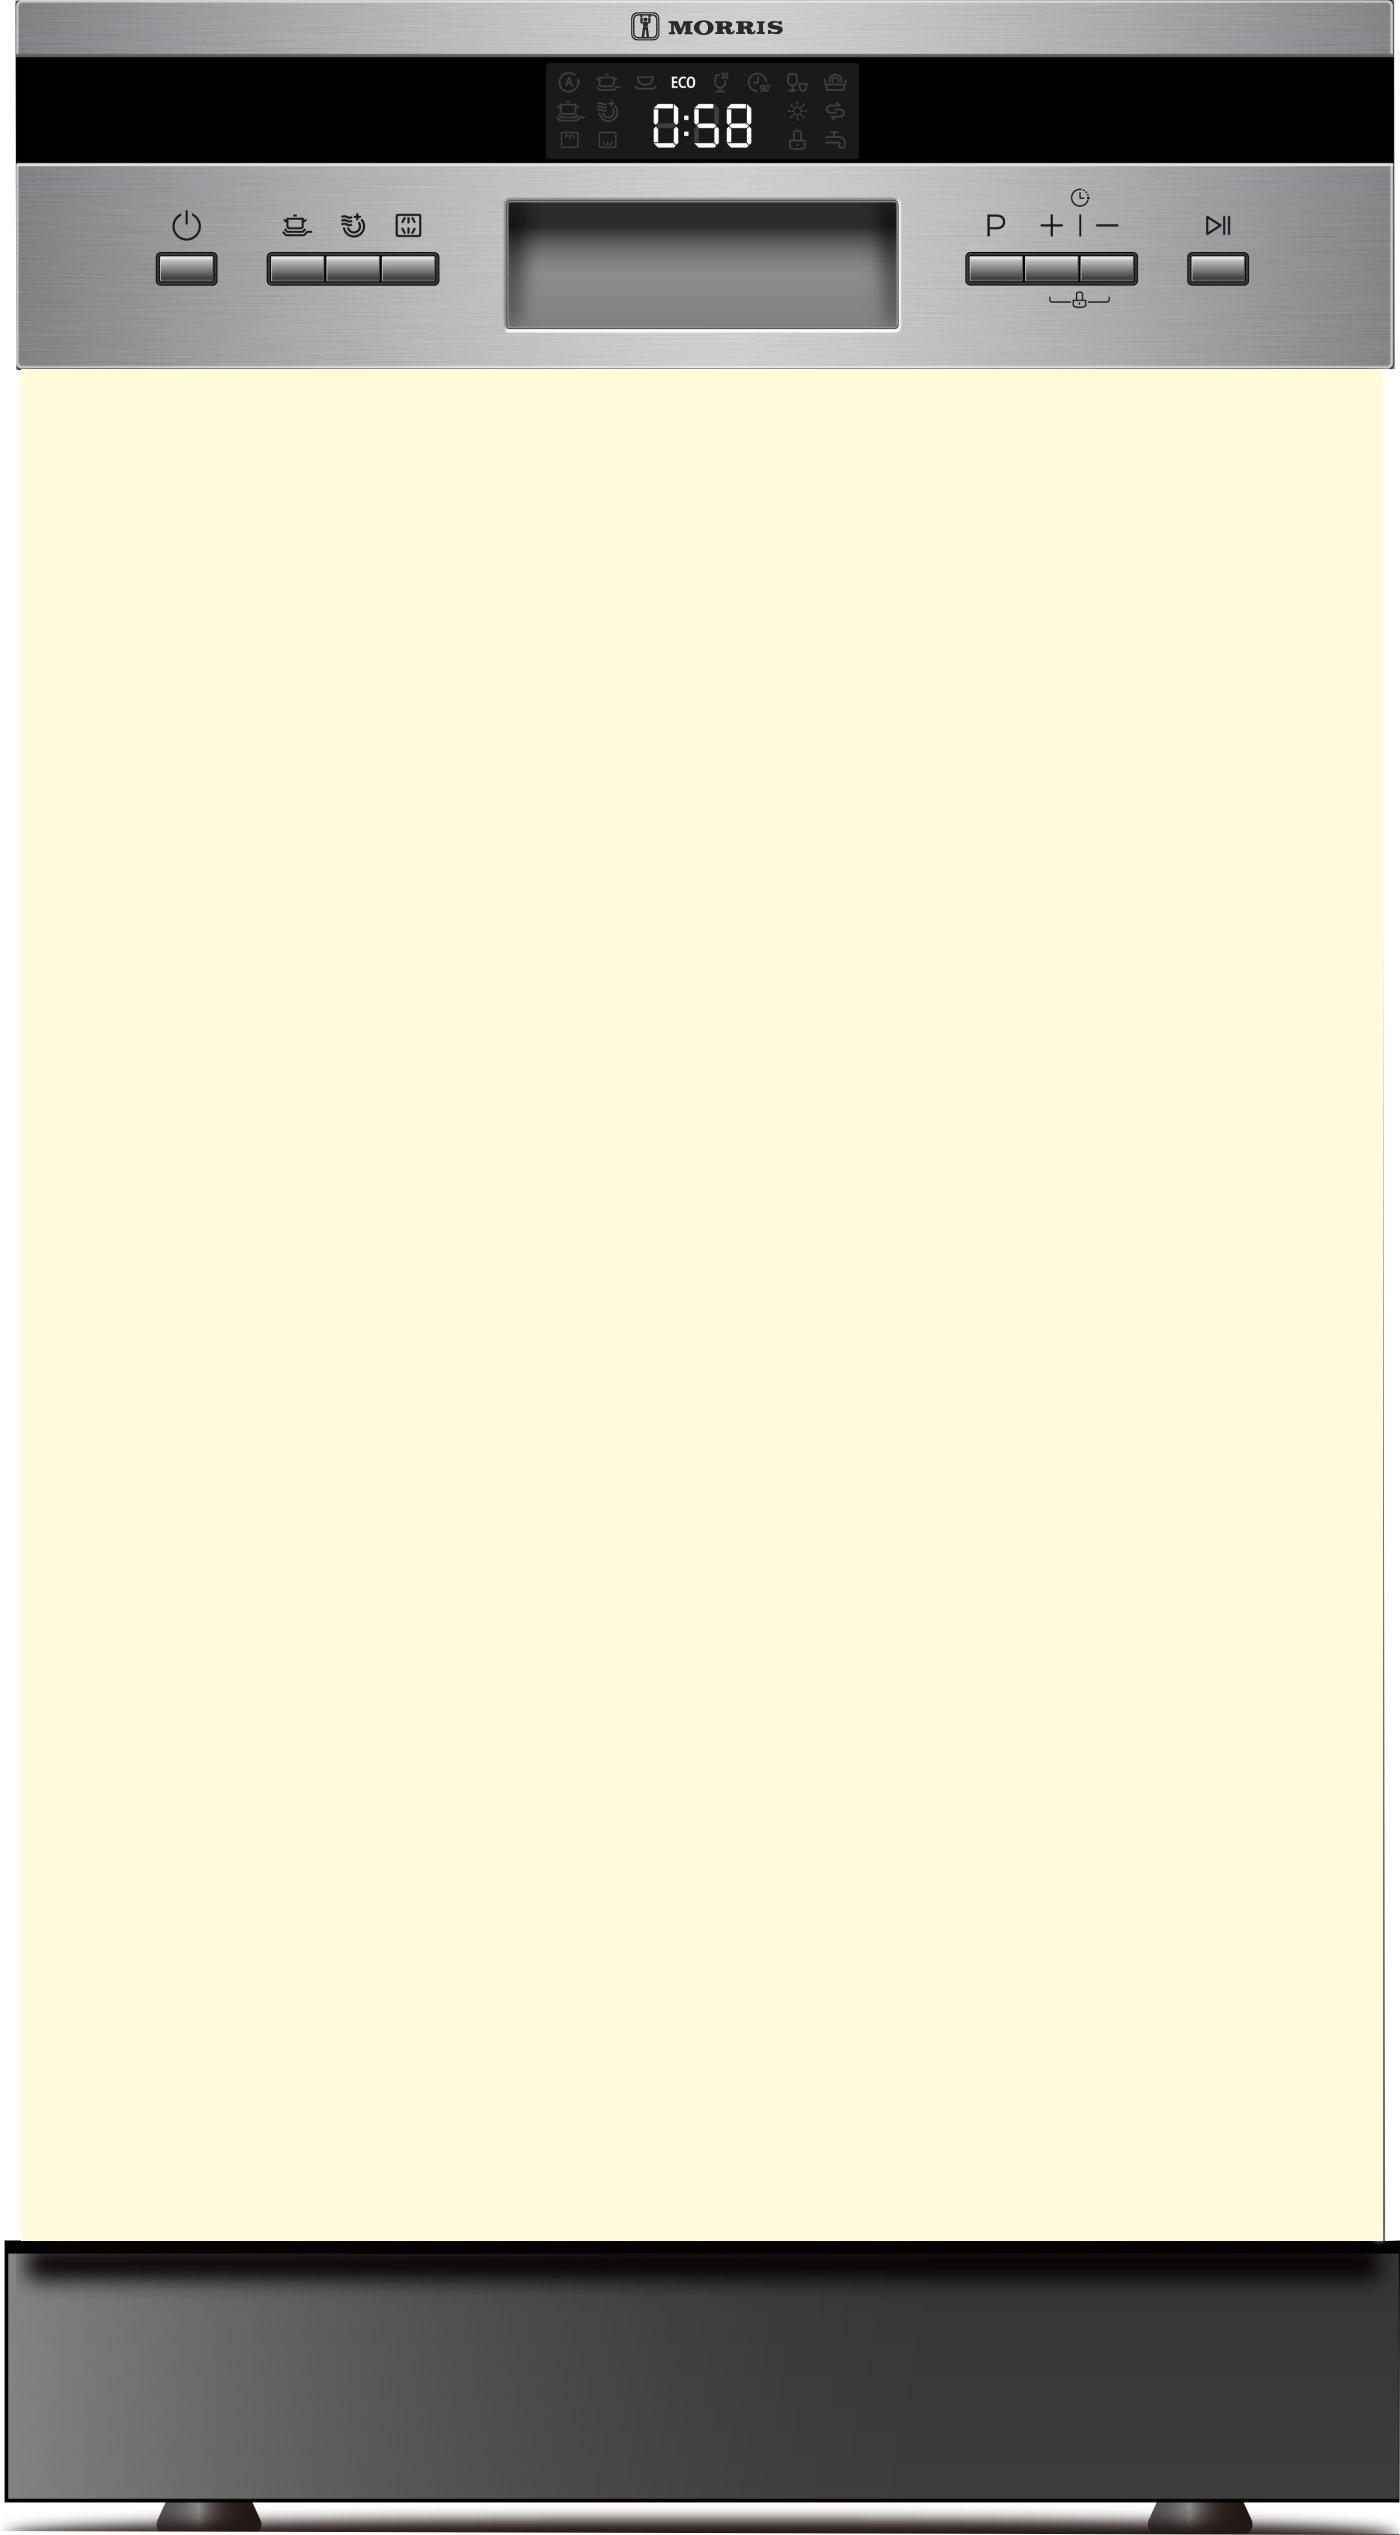 MORRIS SII-45107 ΠΛΥΝΤΗΡΙΟ ΠΙΑΤΩΝ 45ΕΚ ΗΜΙ-ENTOIXIZOMENO